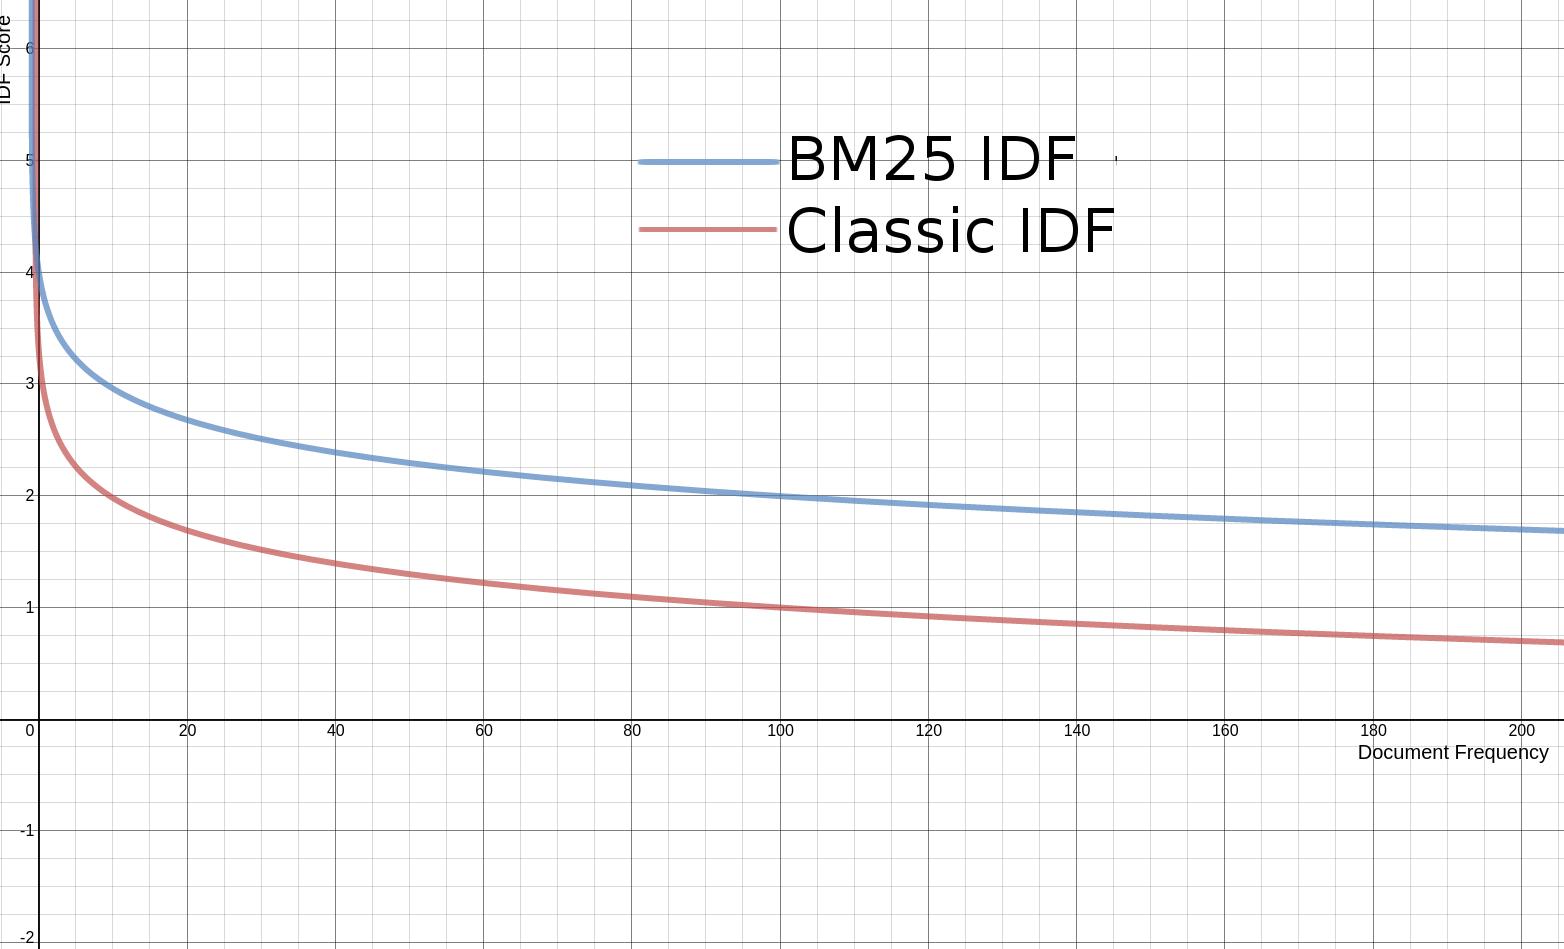 BM25 IDF vs Lucene Classic IDF